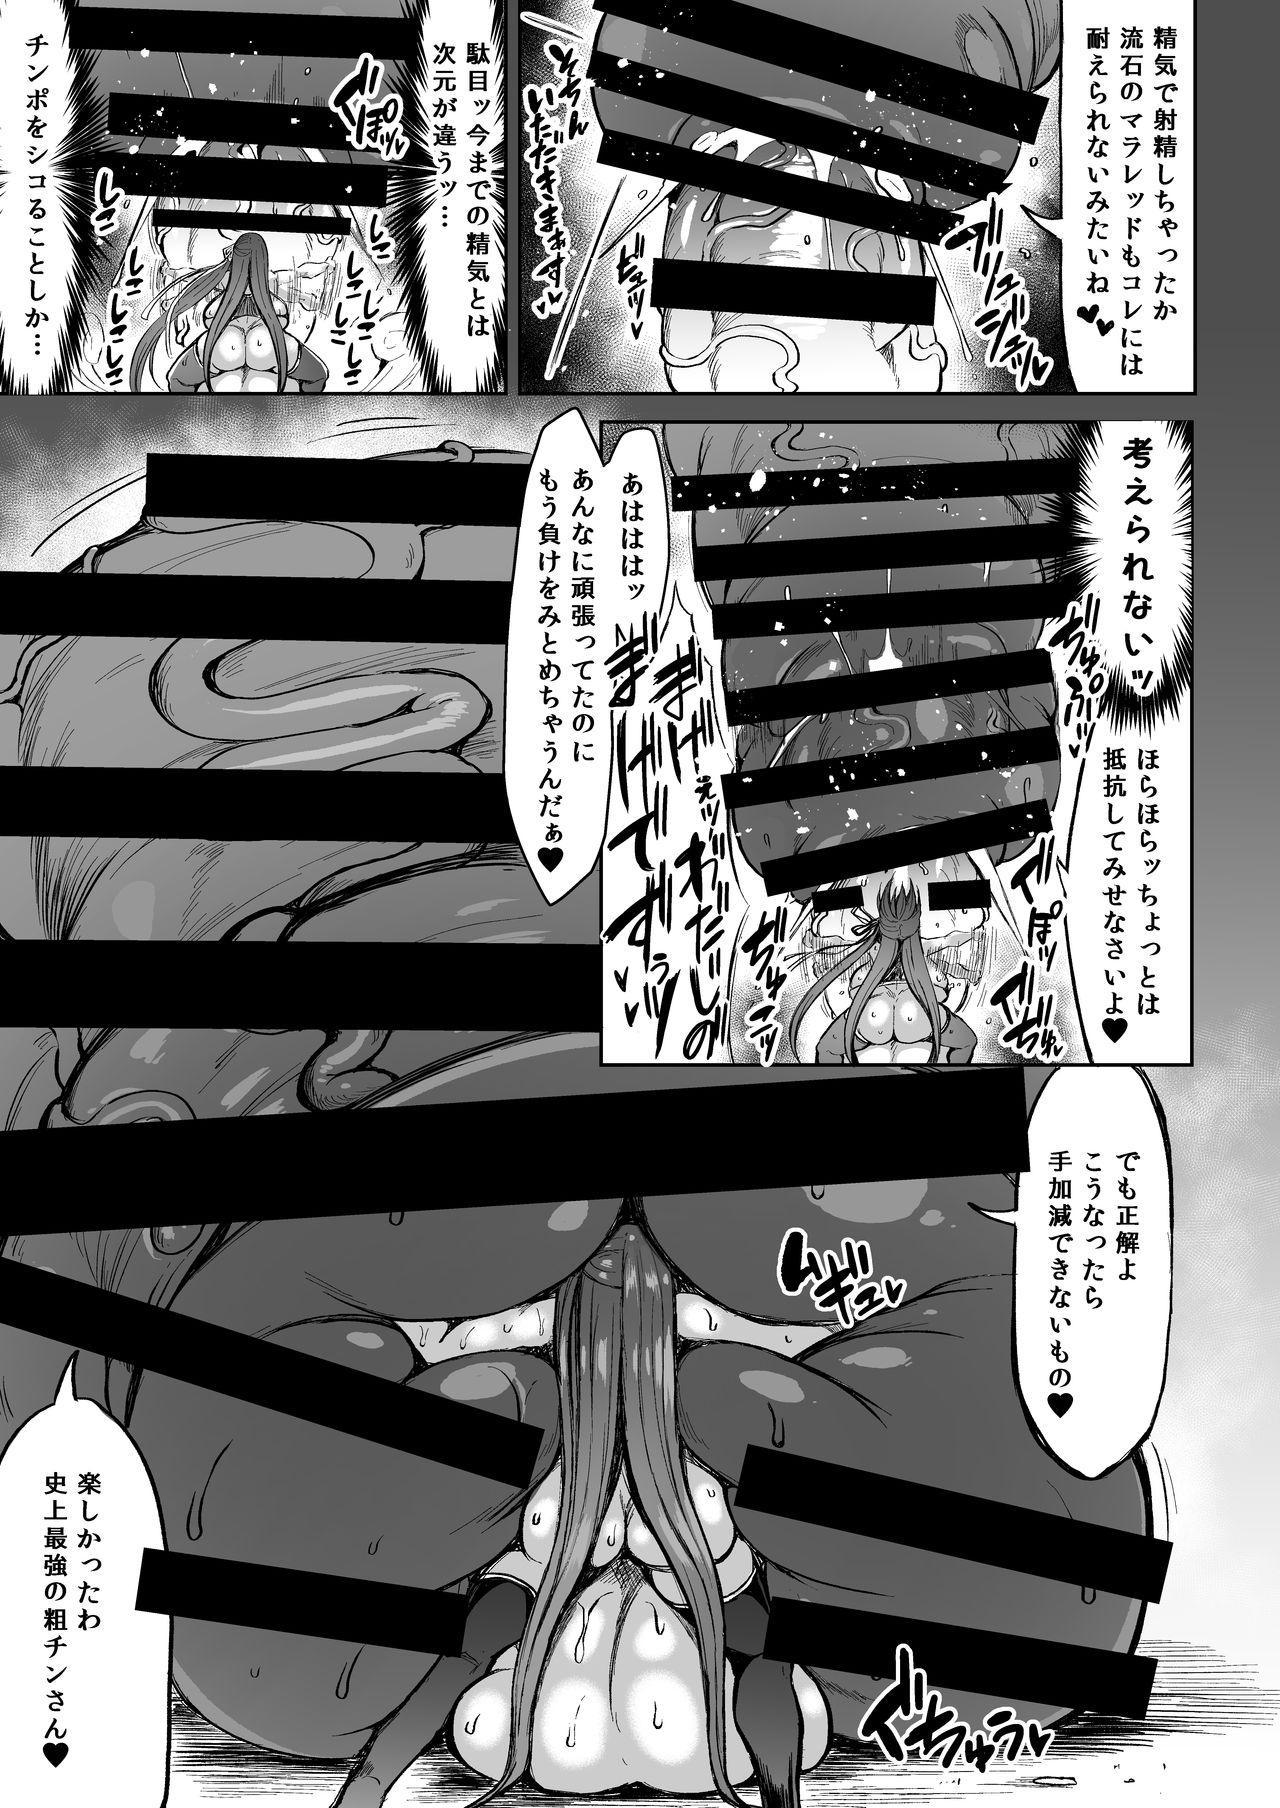 Choukon Senshi Justimara 2 18